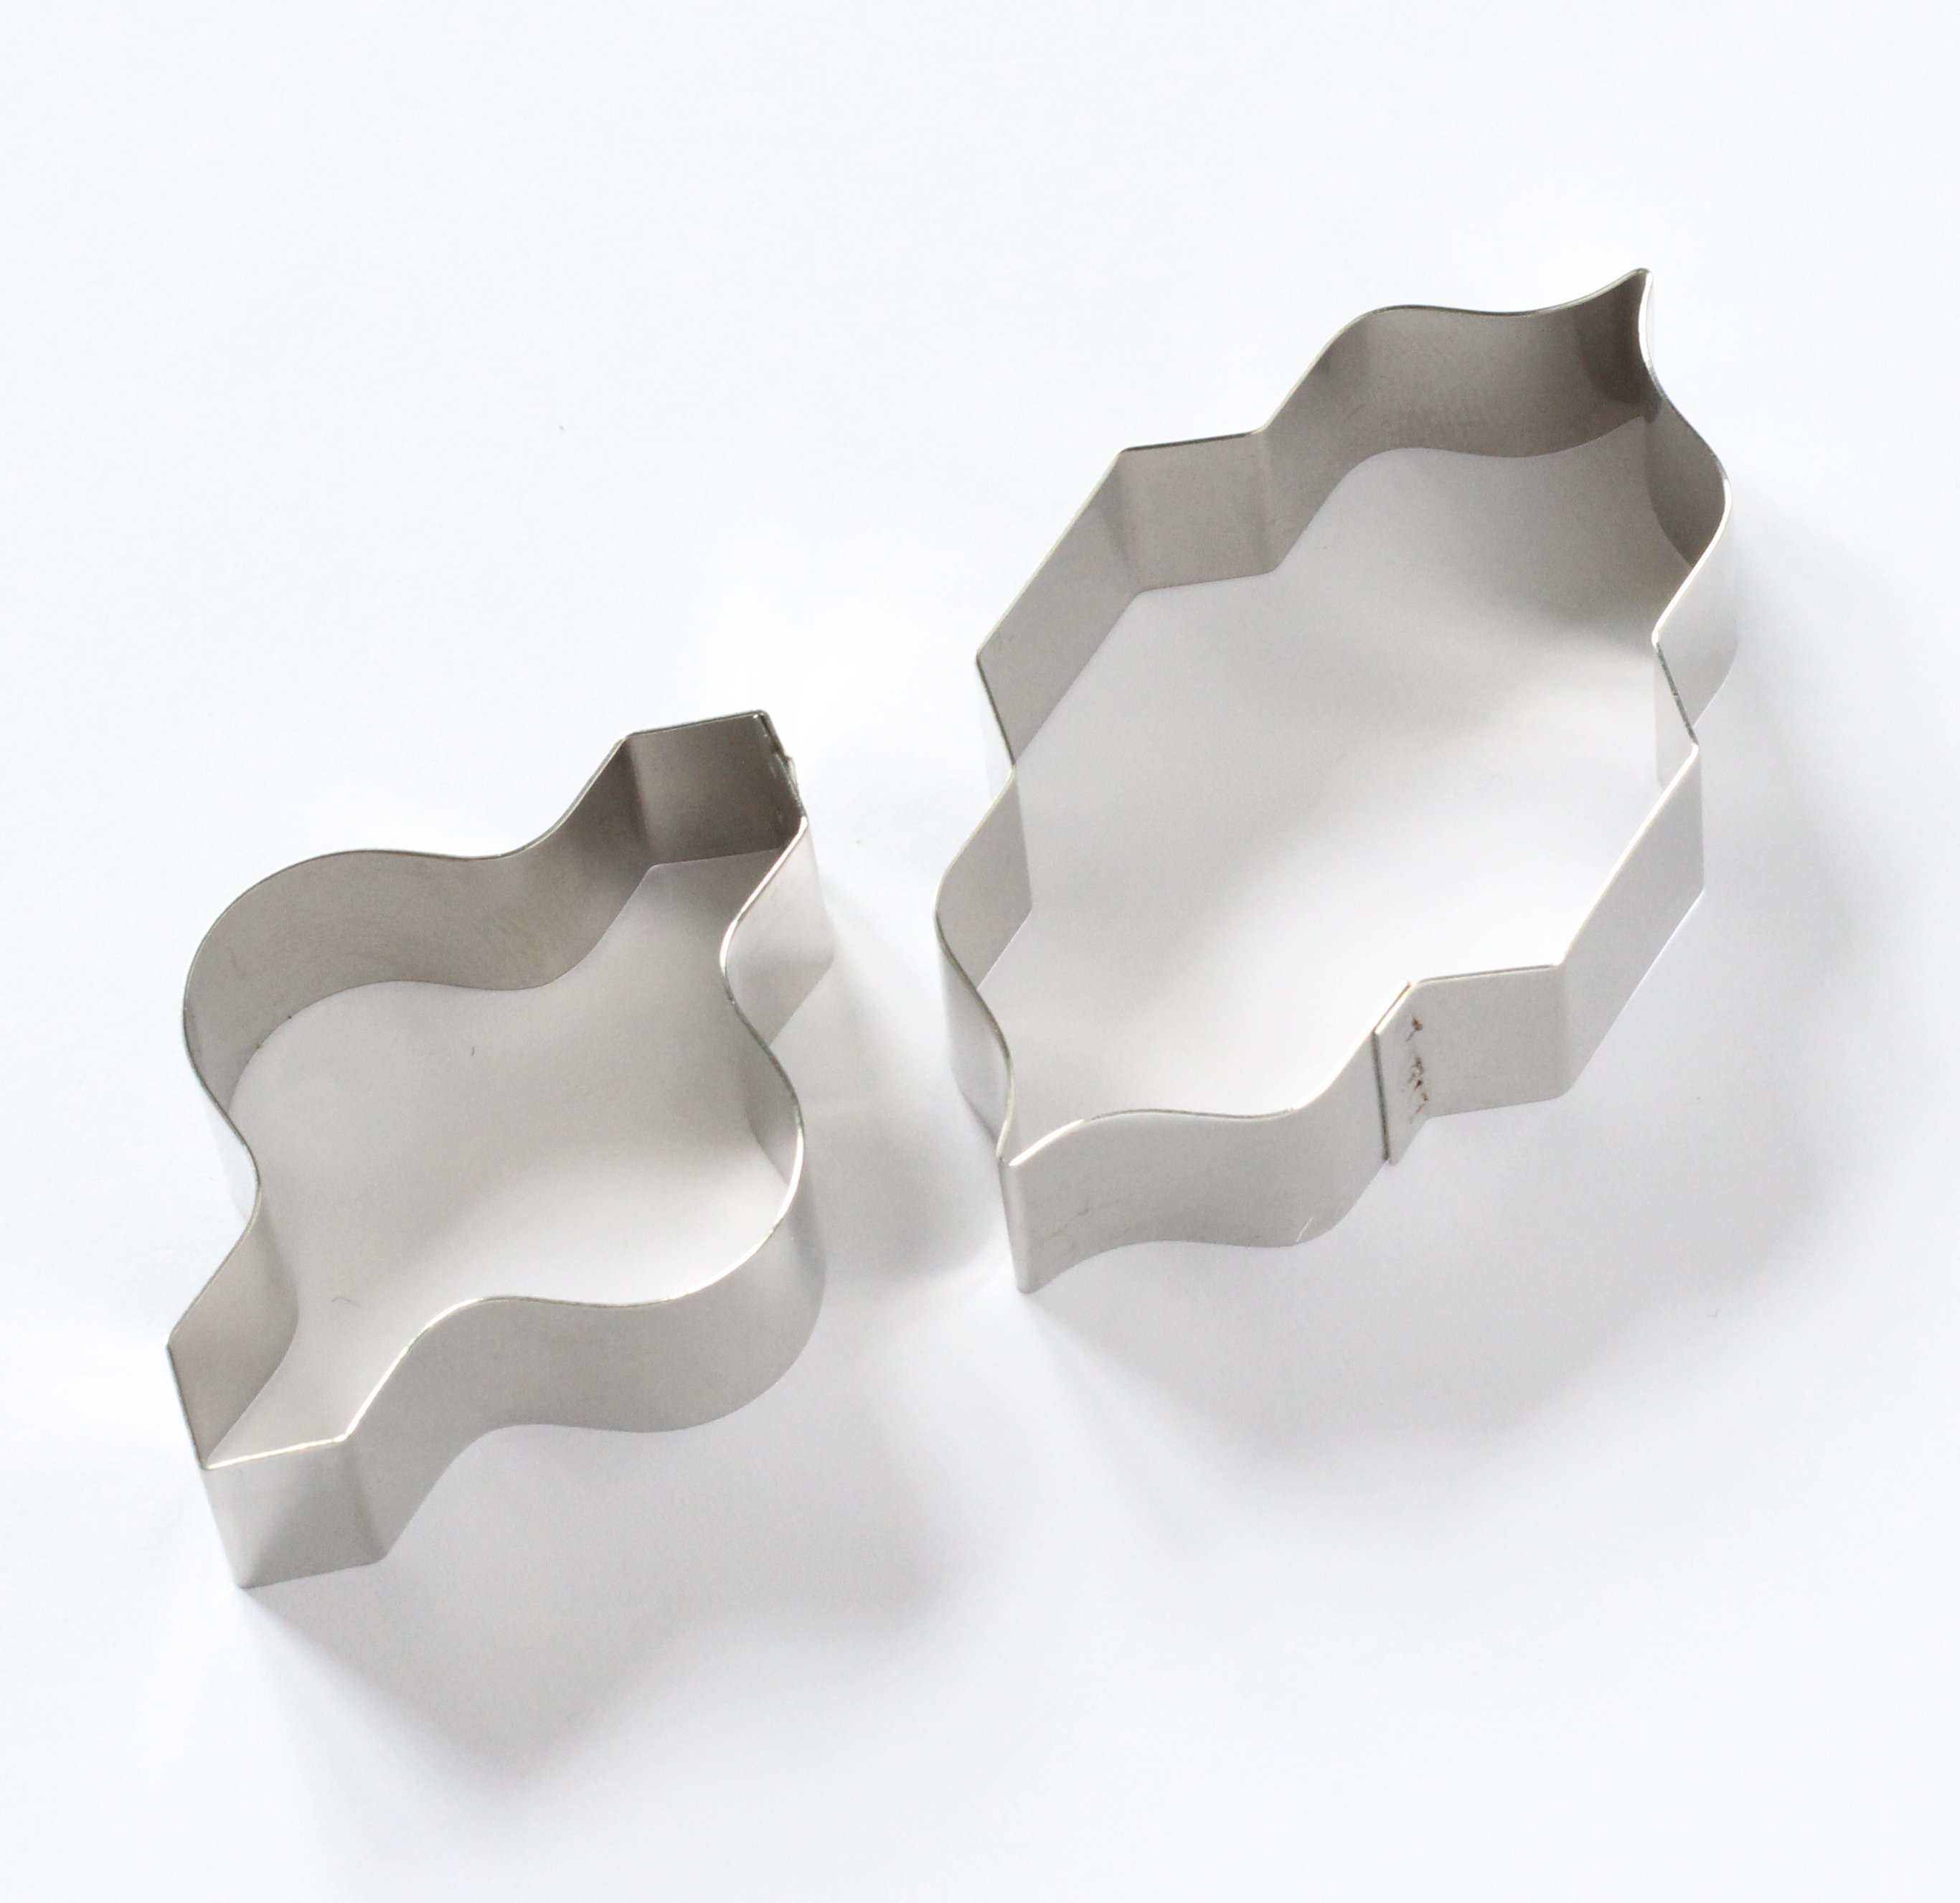 Tile - Medium Interlocking Moroccan Tile Sugarcraft Cutter Set (Lindy's) SKU178931231213111411